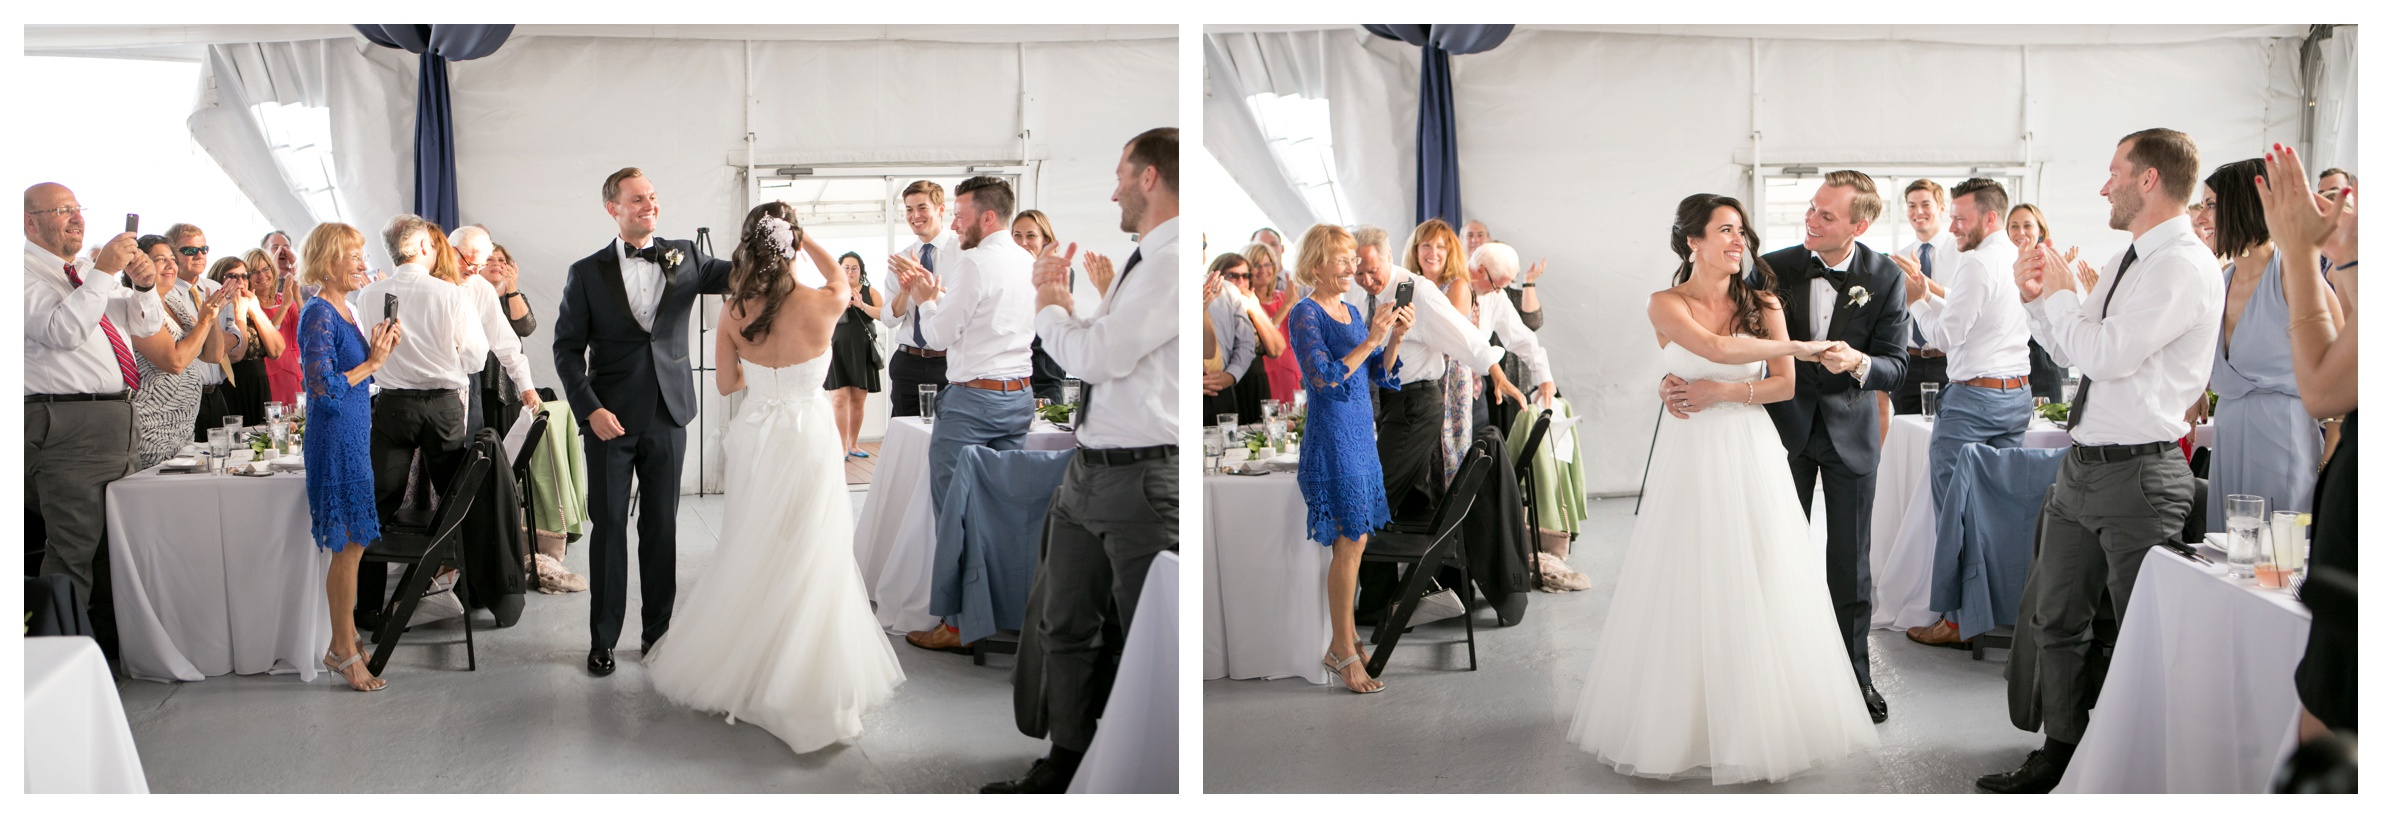 columbia-yacht-club-chicago-wedding_0038.jpg